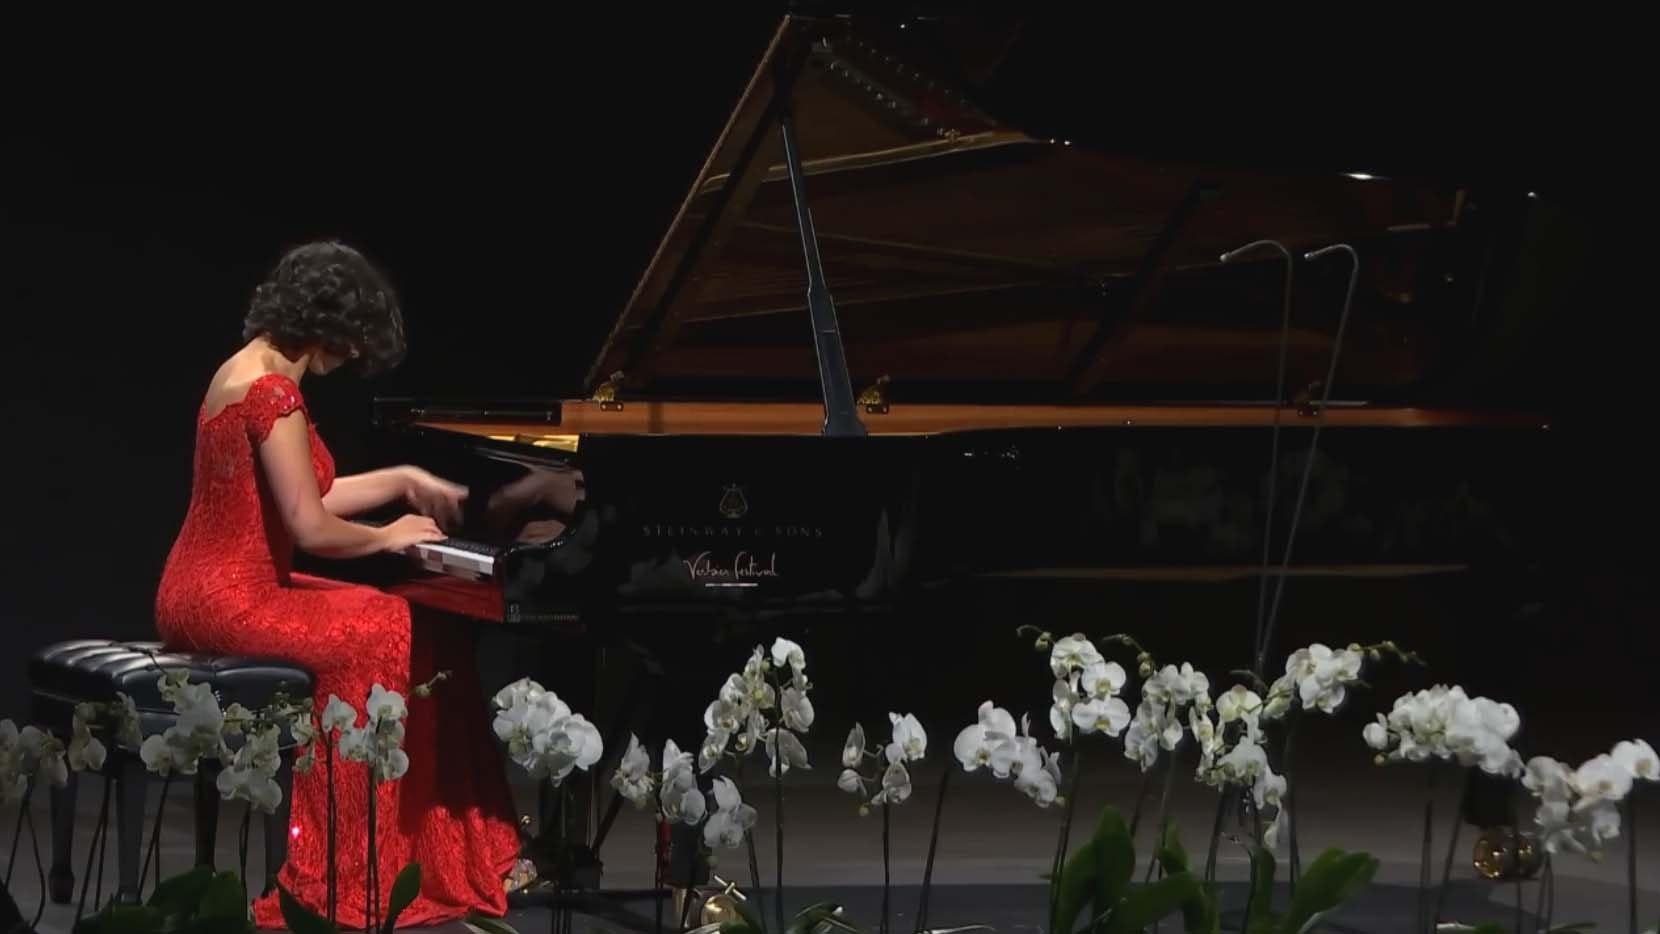 Khatia Buniatishvili performs Ravel, Liszt and Stravinsky